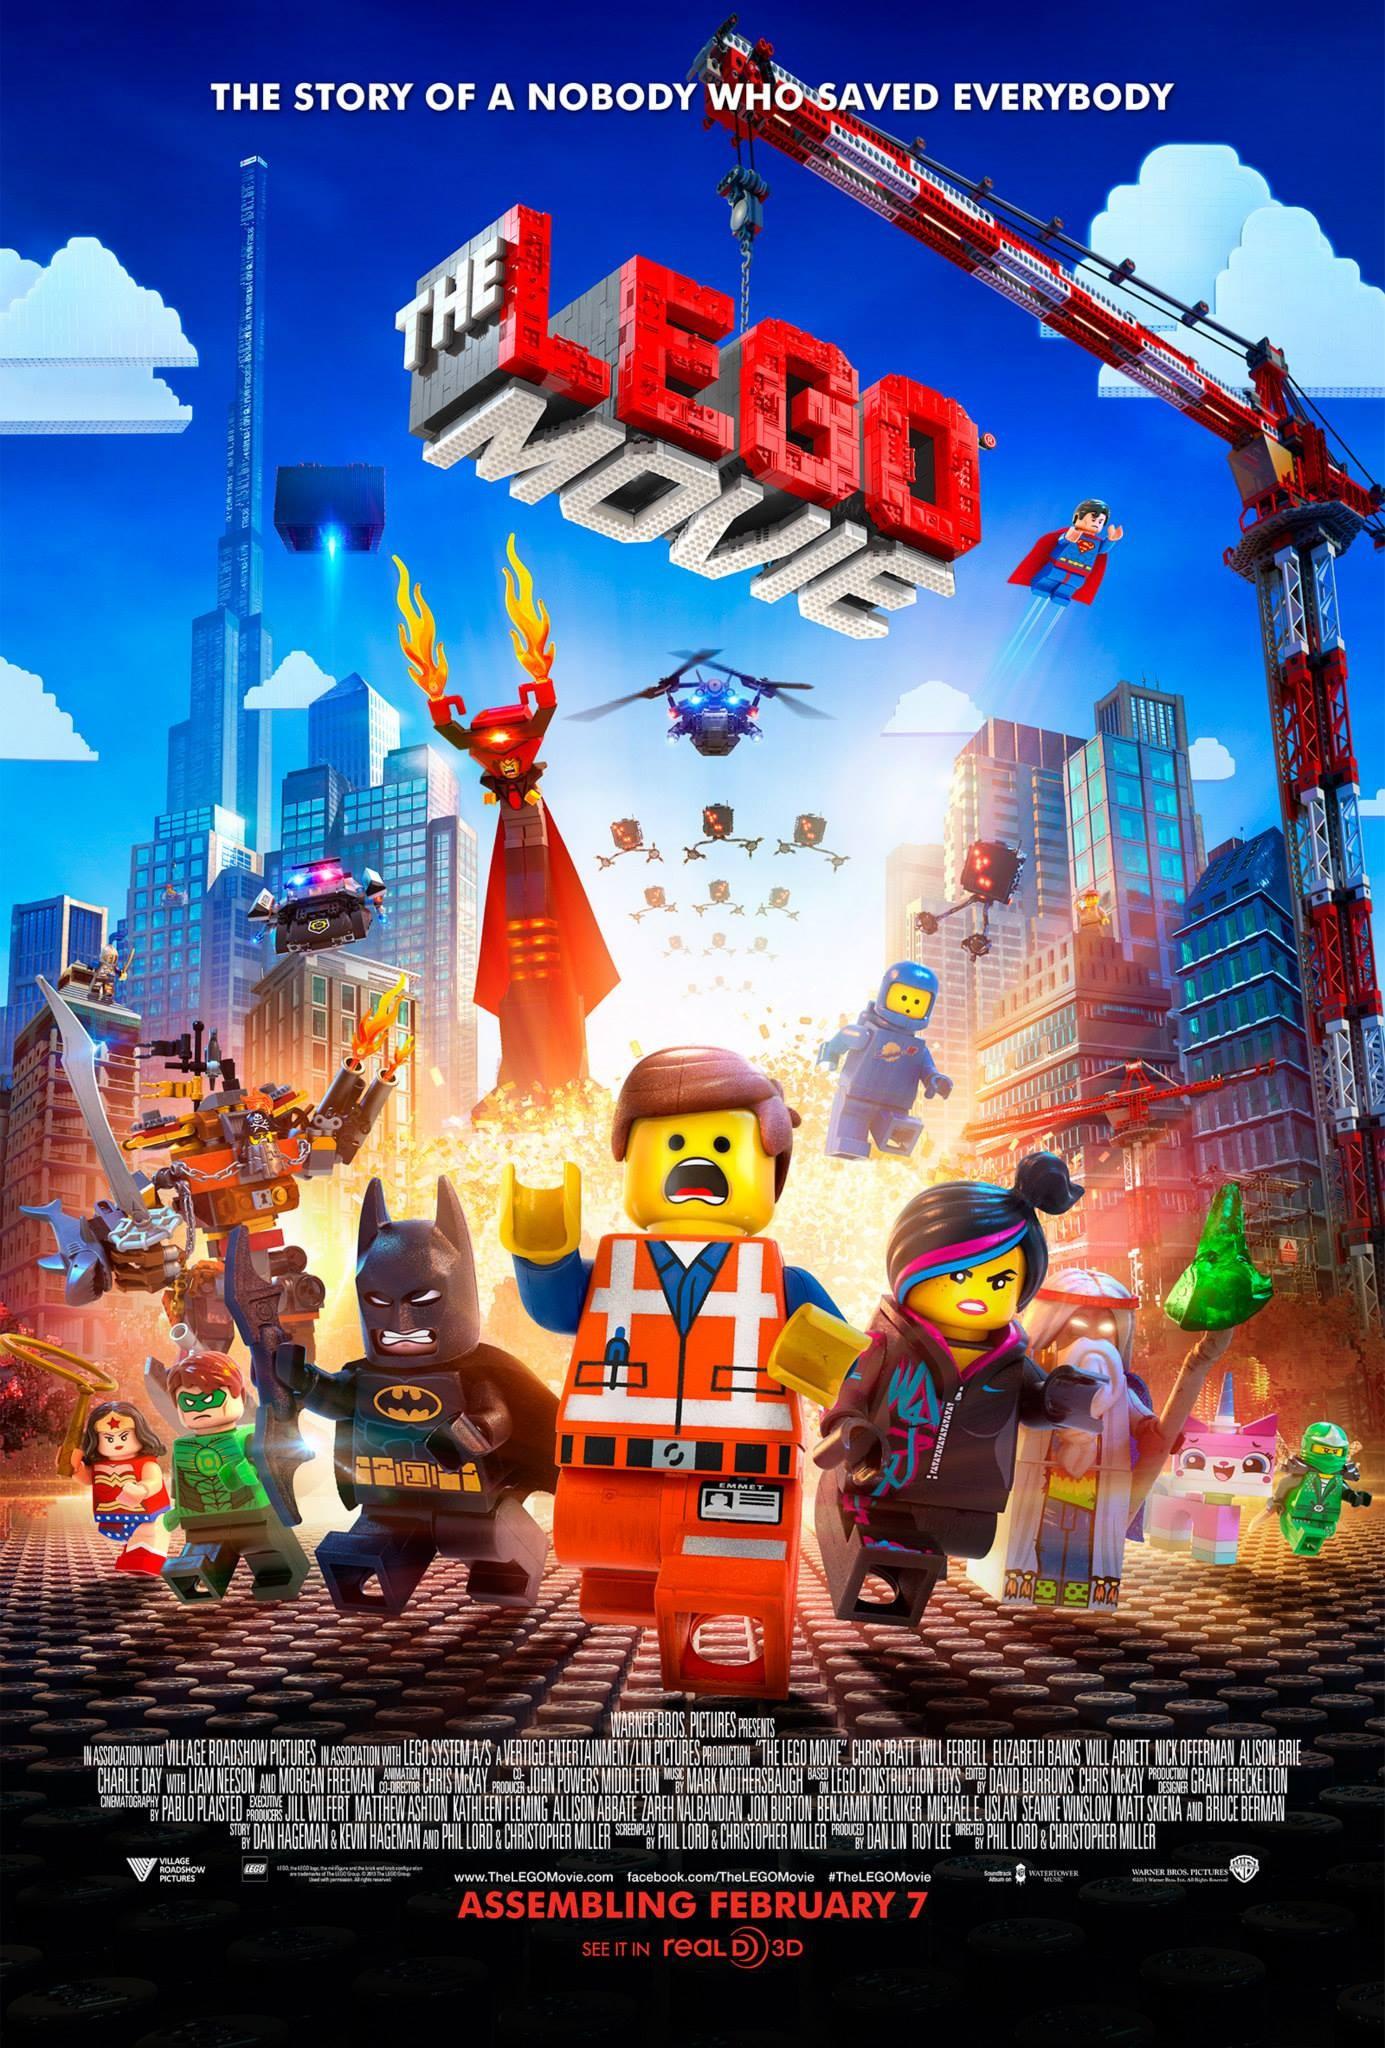 LEGO-Movie-Poster-2014-HIgh-Resolution.jpg